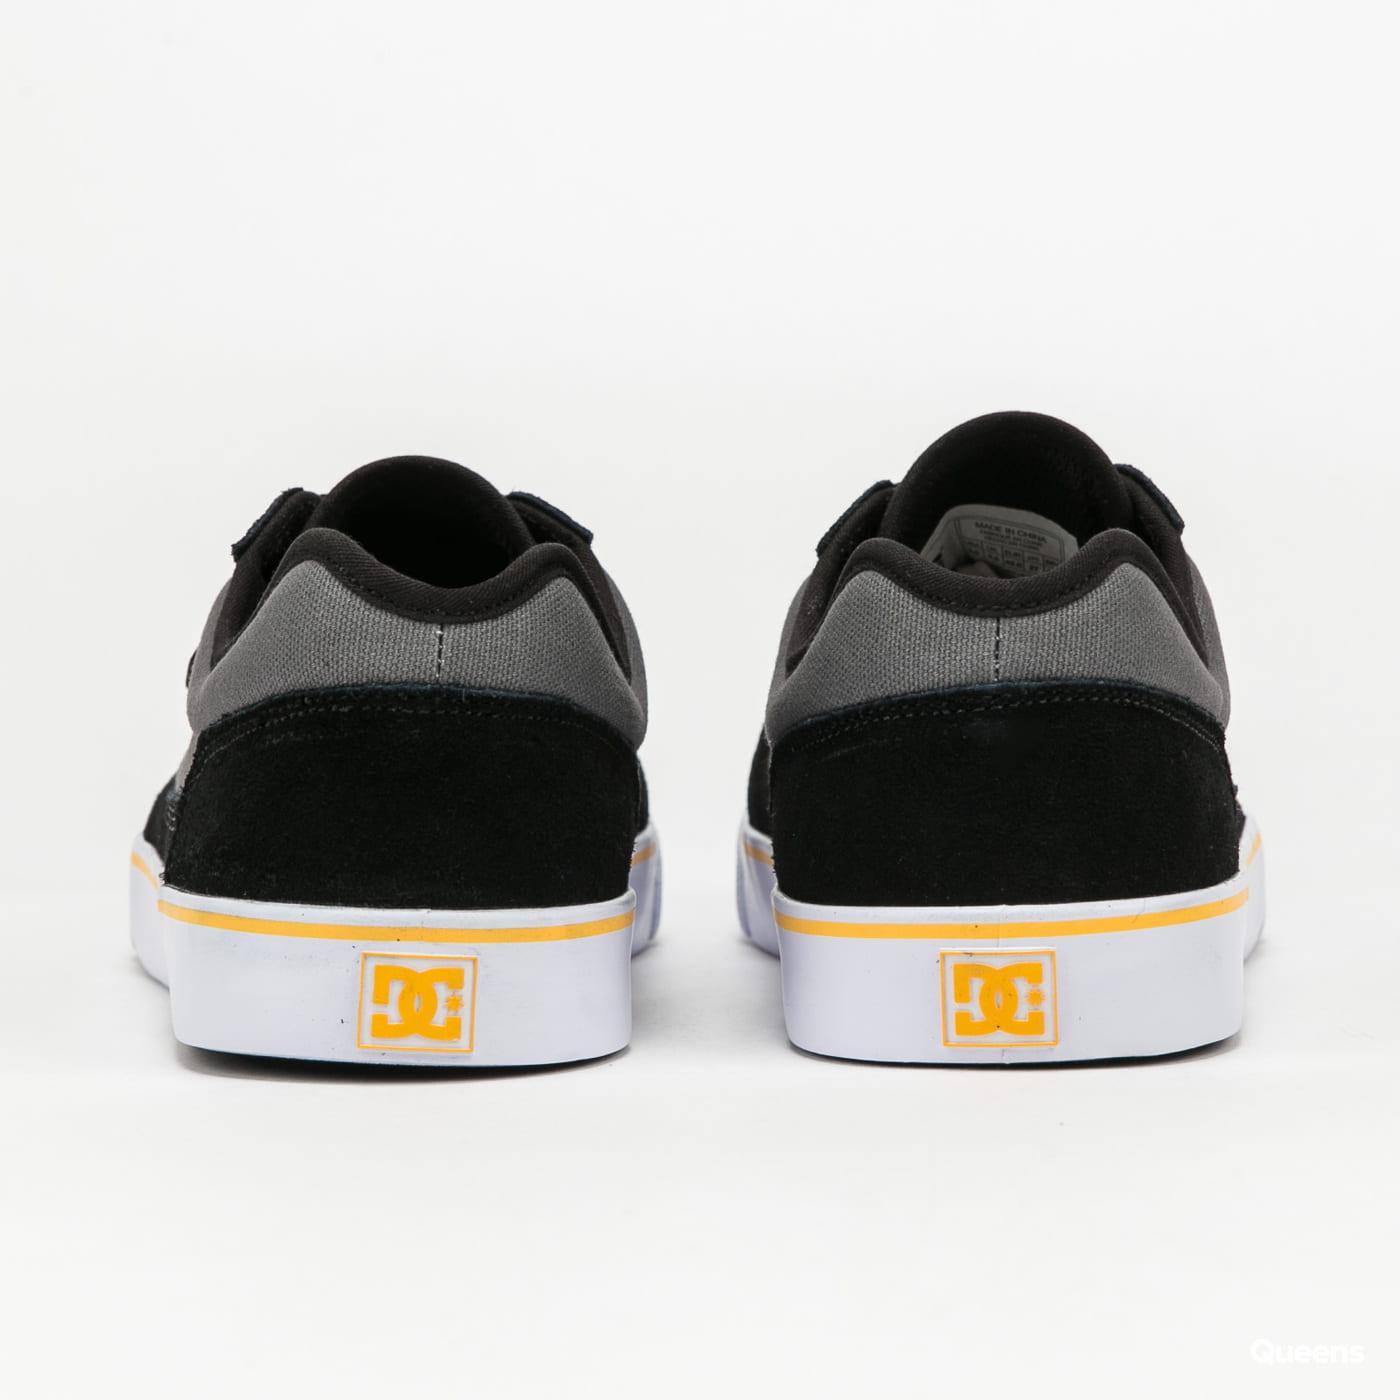 DC Tonik black / grey / yellow